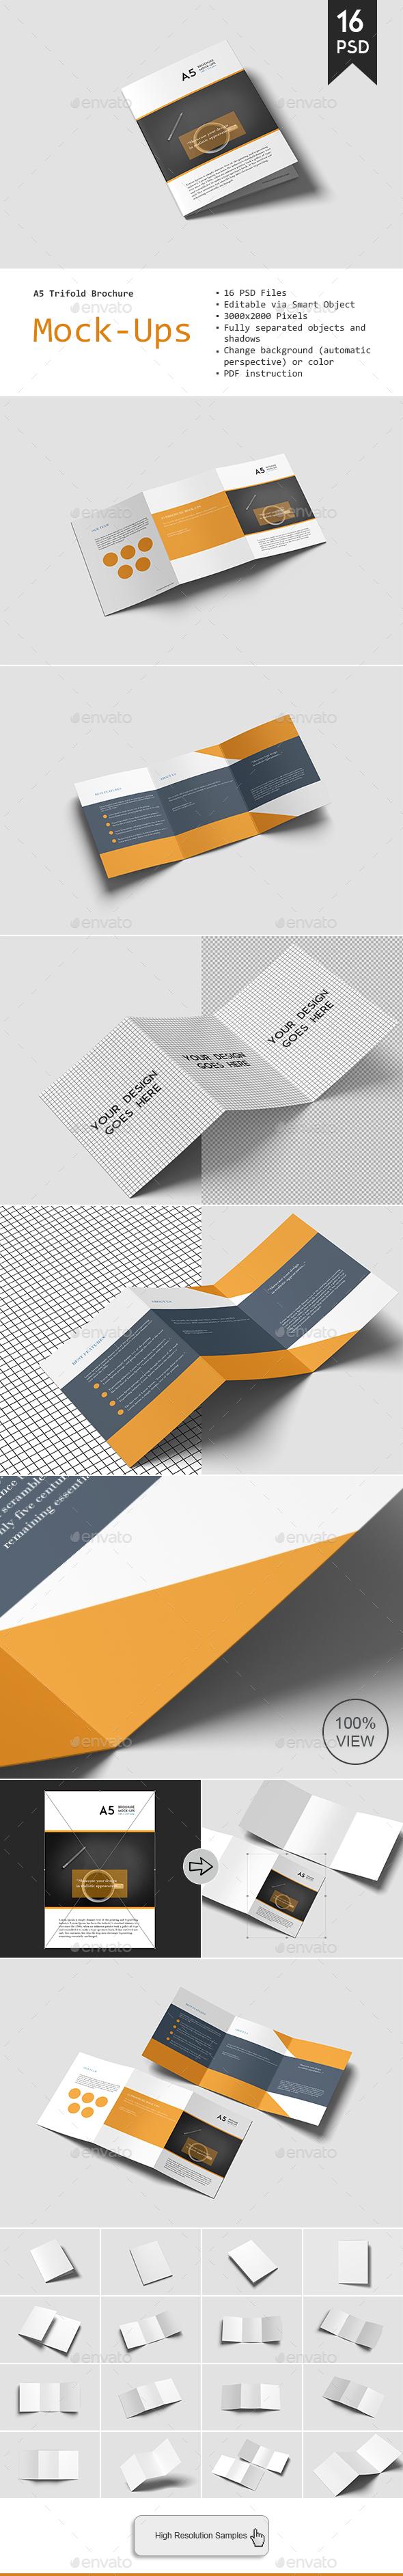 GraphicRiver A5 Trifold Brochure Mockup 20898168